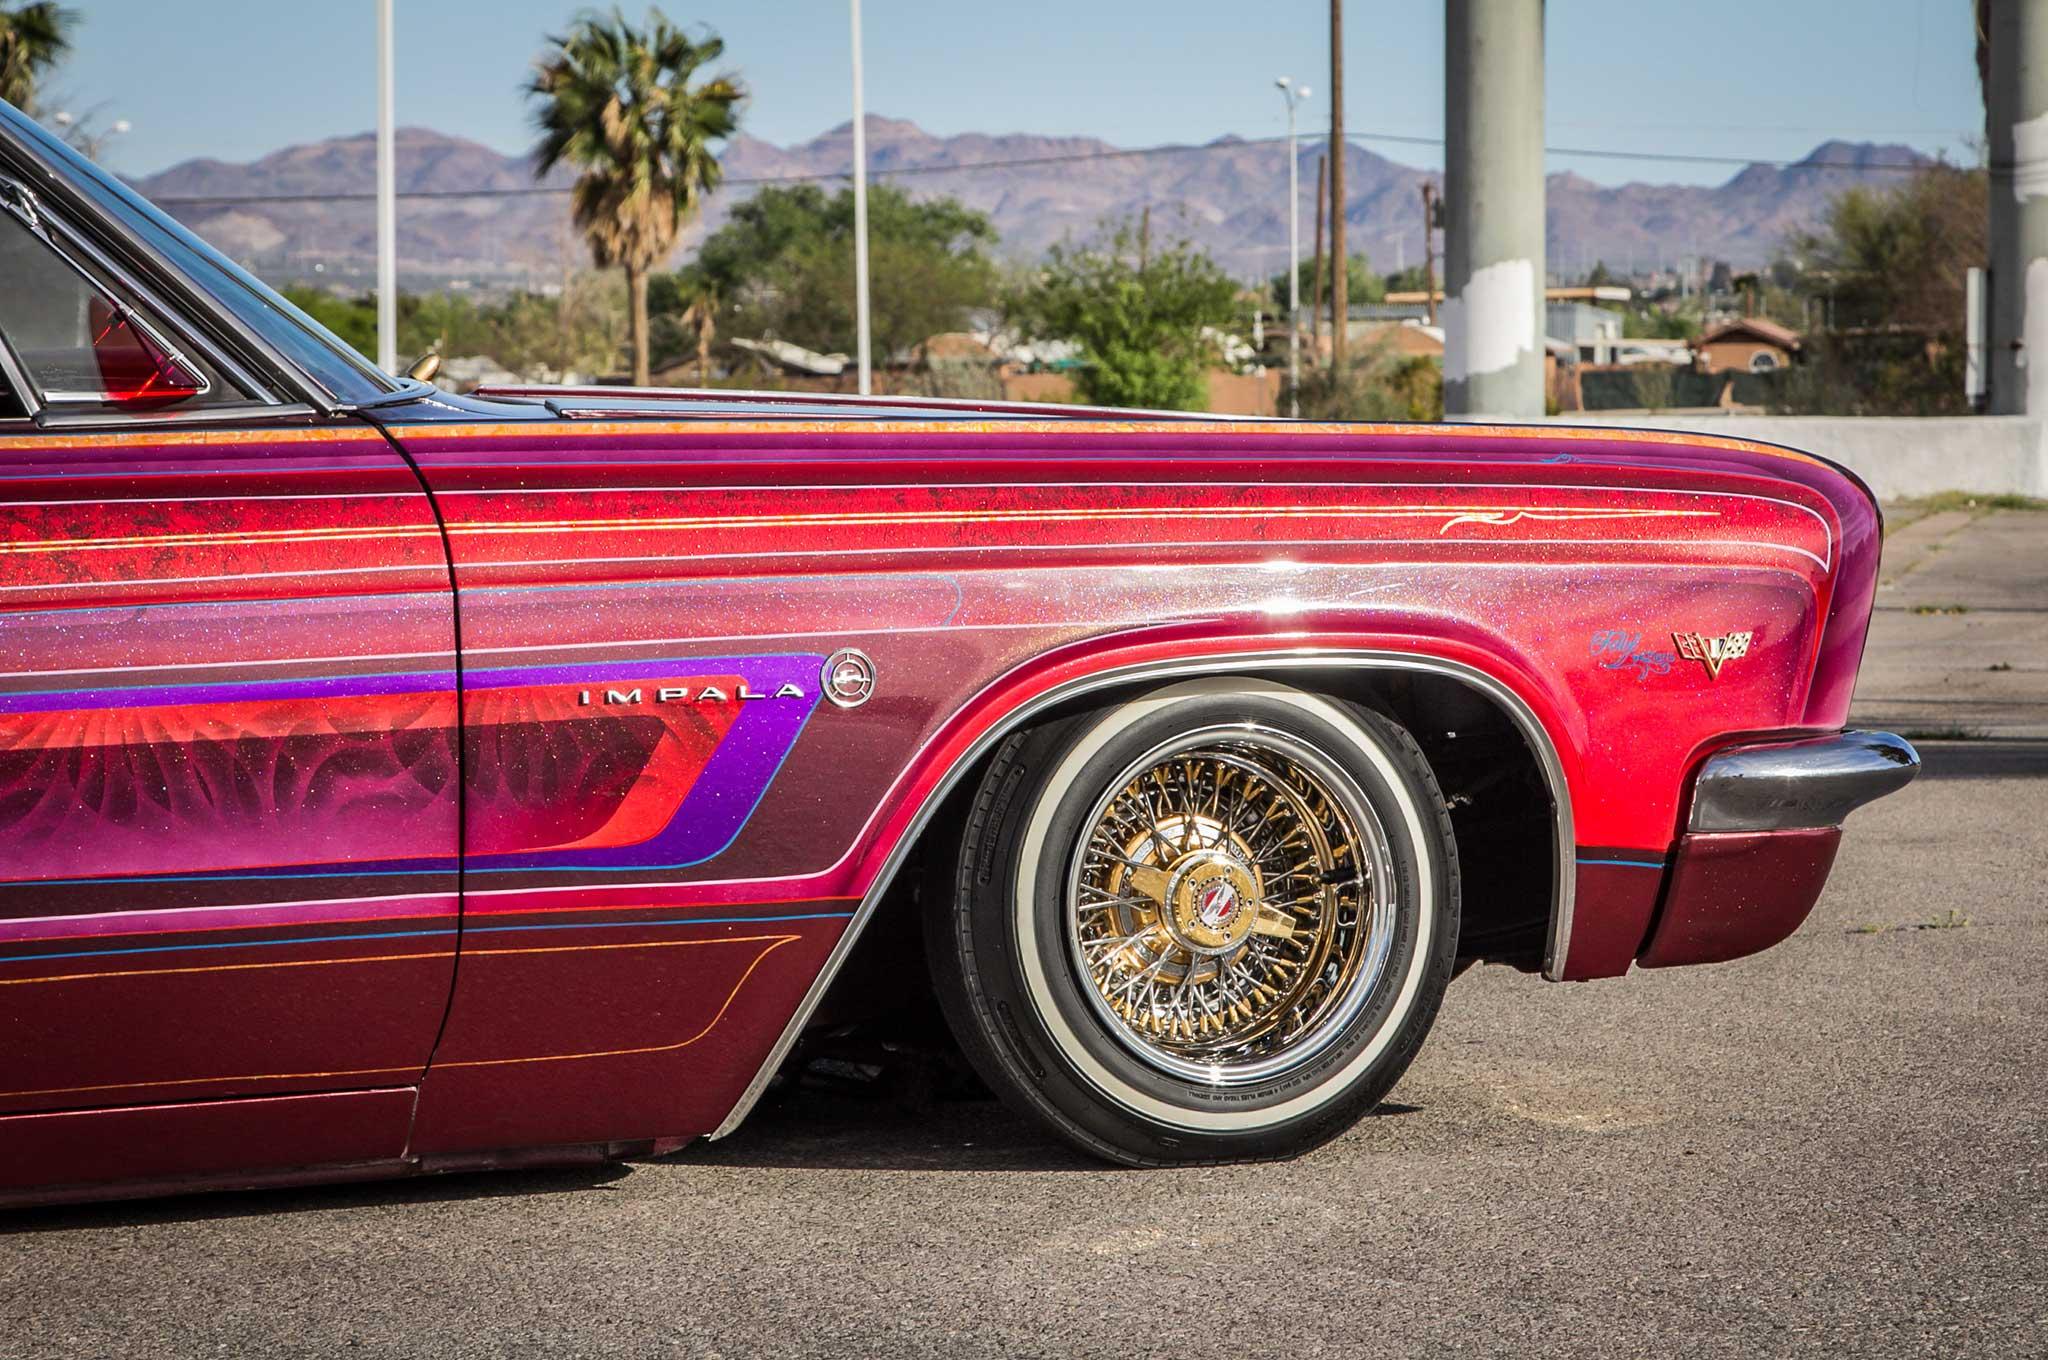 1966 Chevrolet Impala Junkyard Jewel Lowrider Chevy Accessories 15 28